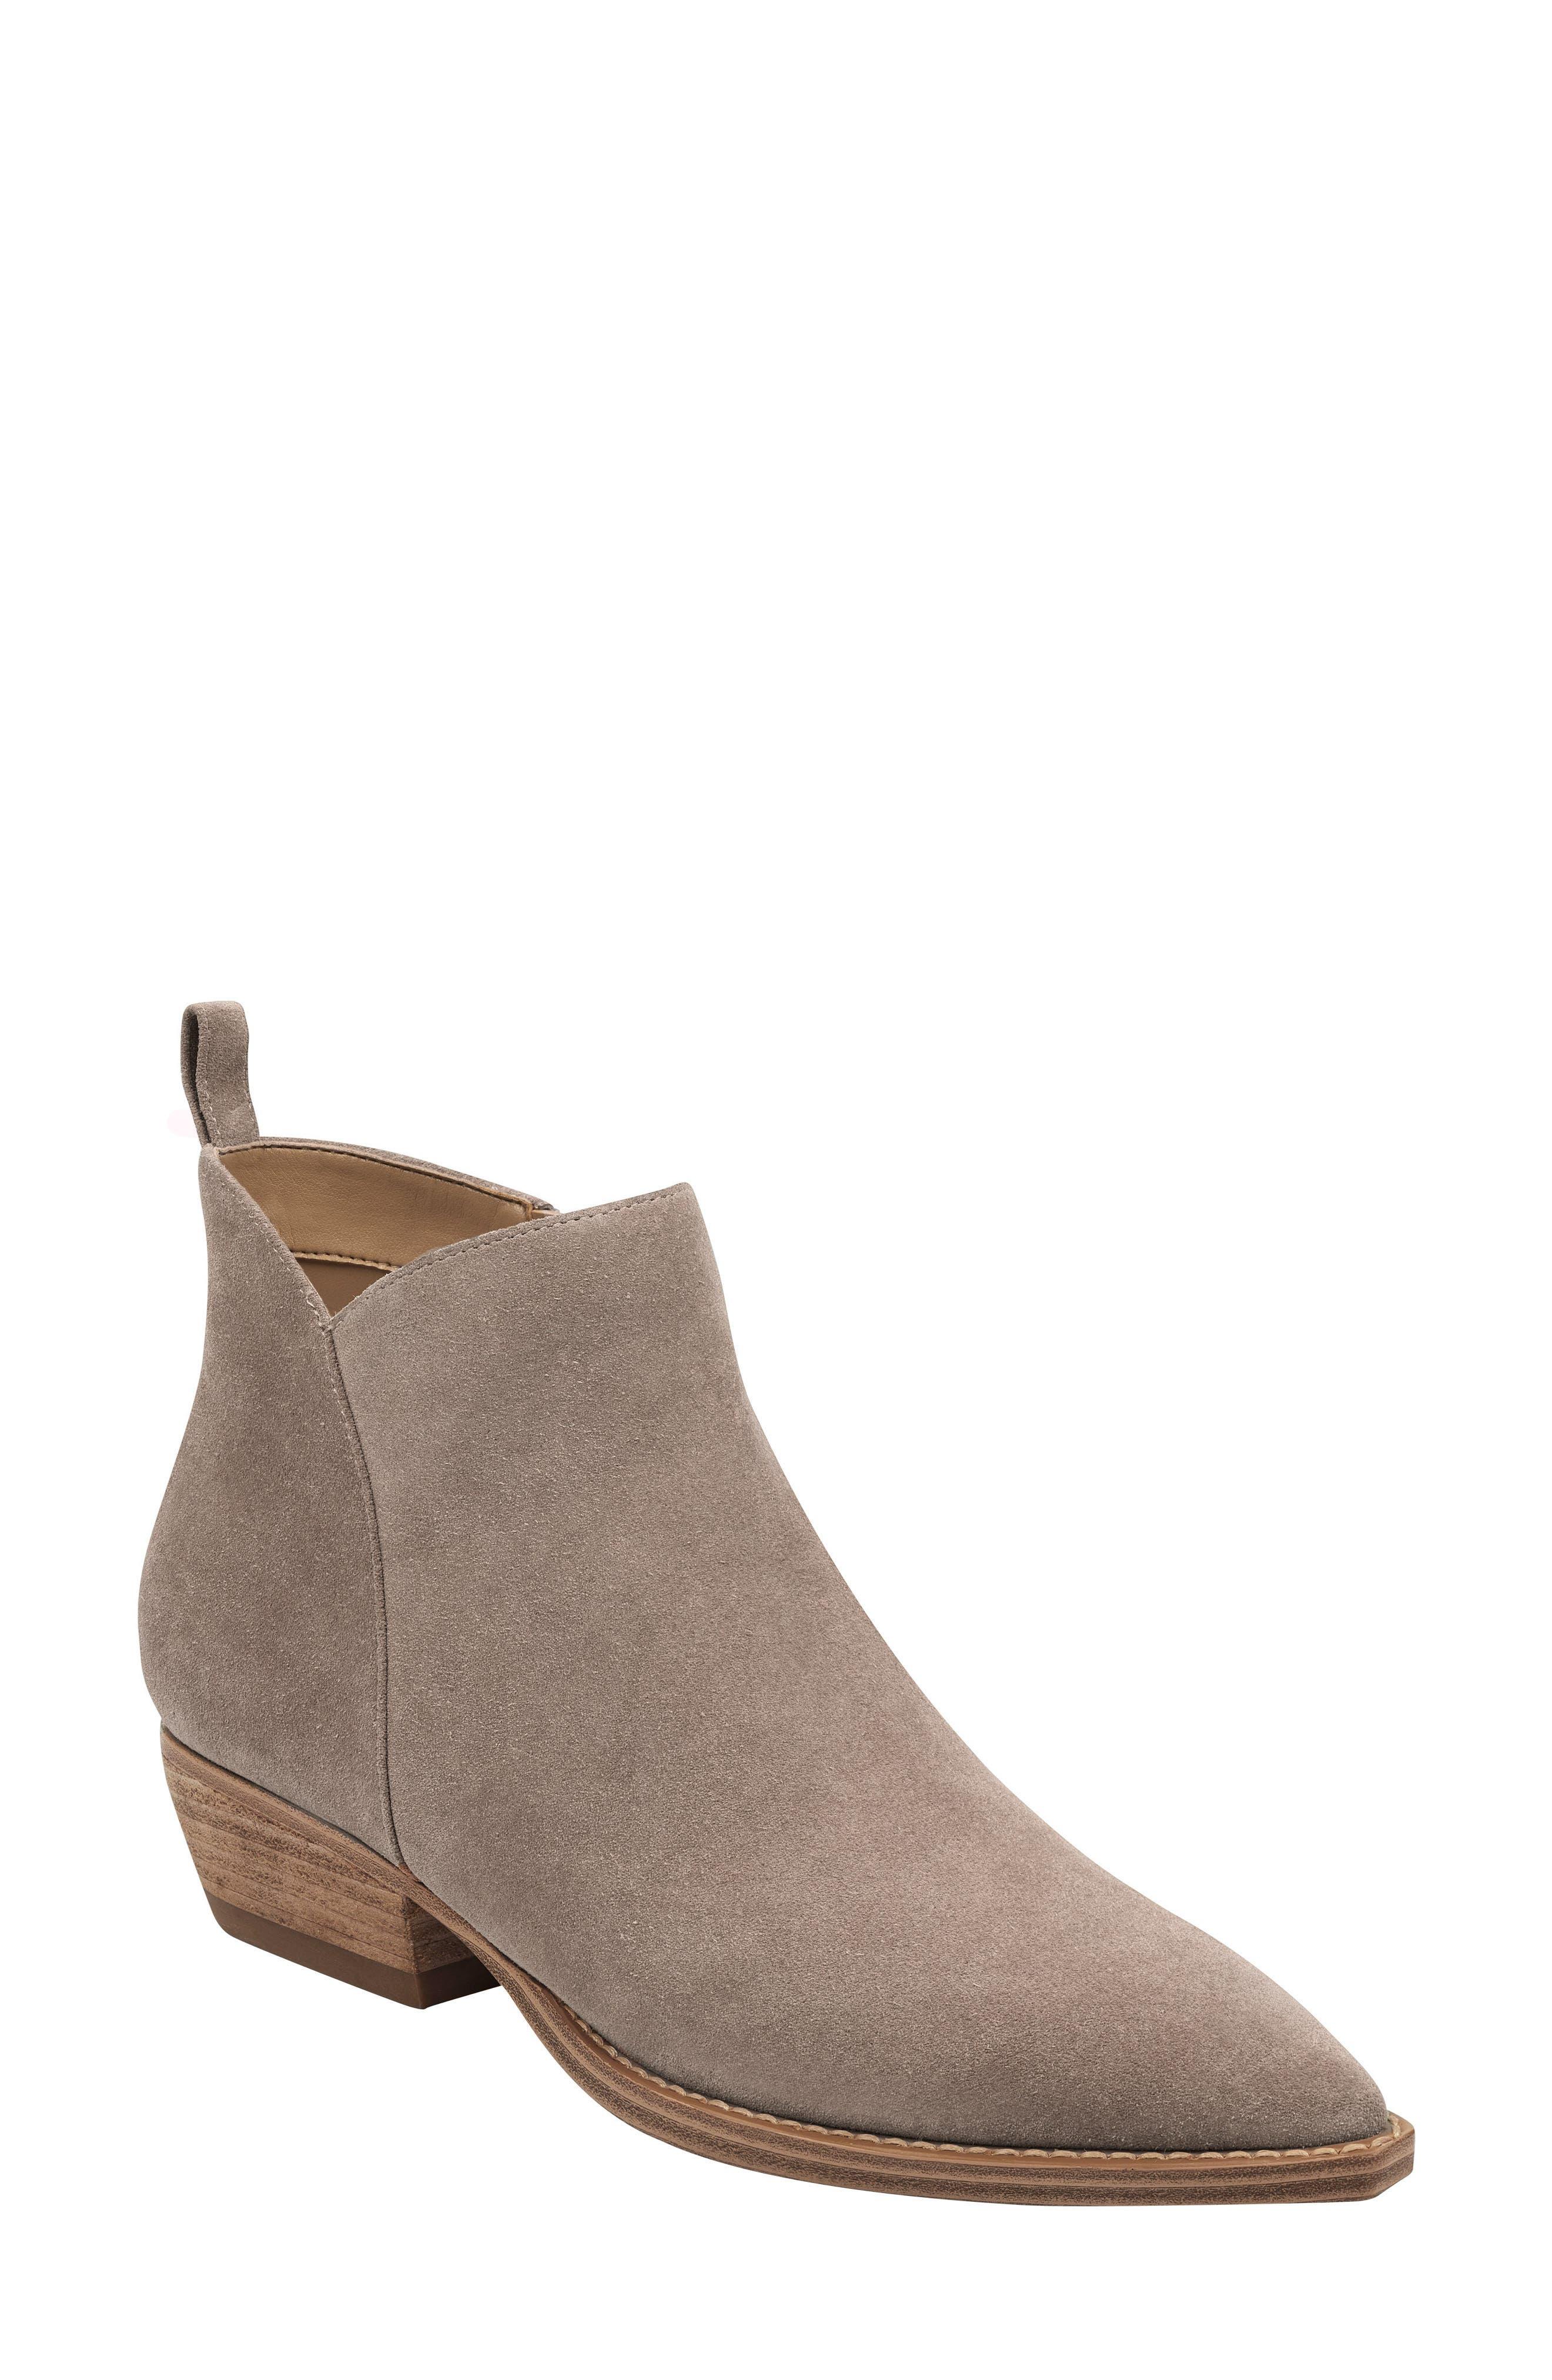 Marc Fisher Ltd Obrra Pointy Toe Bootie- Grey